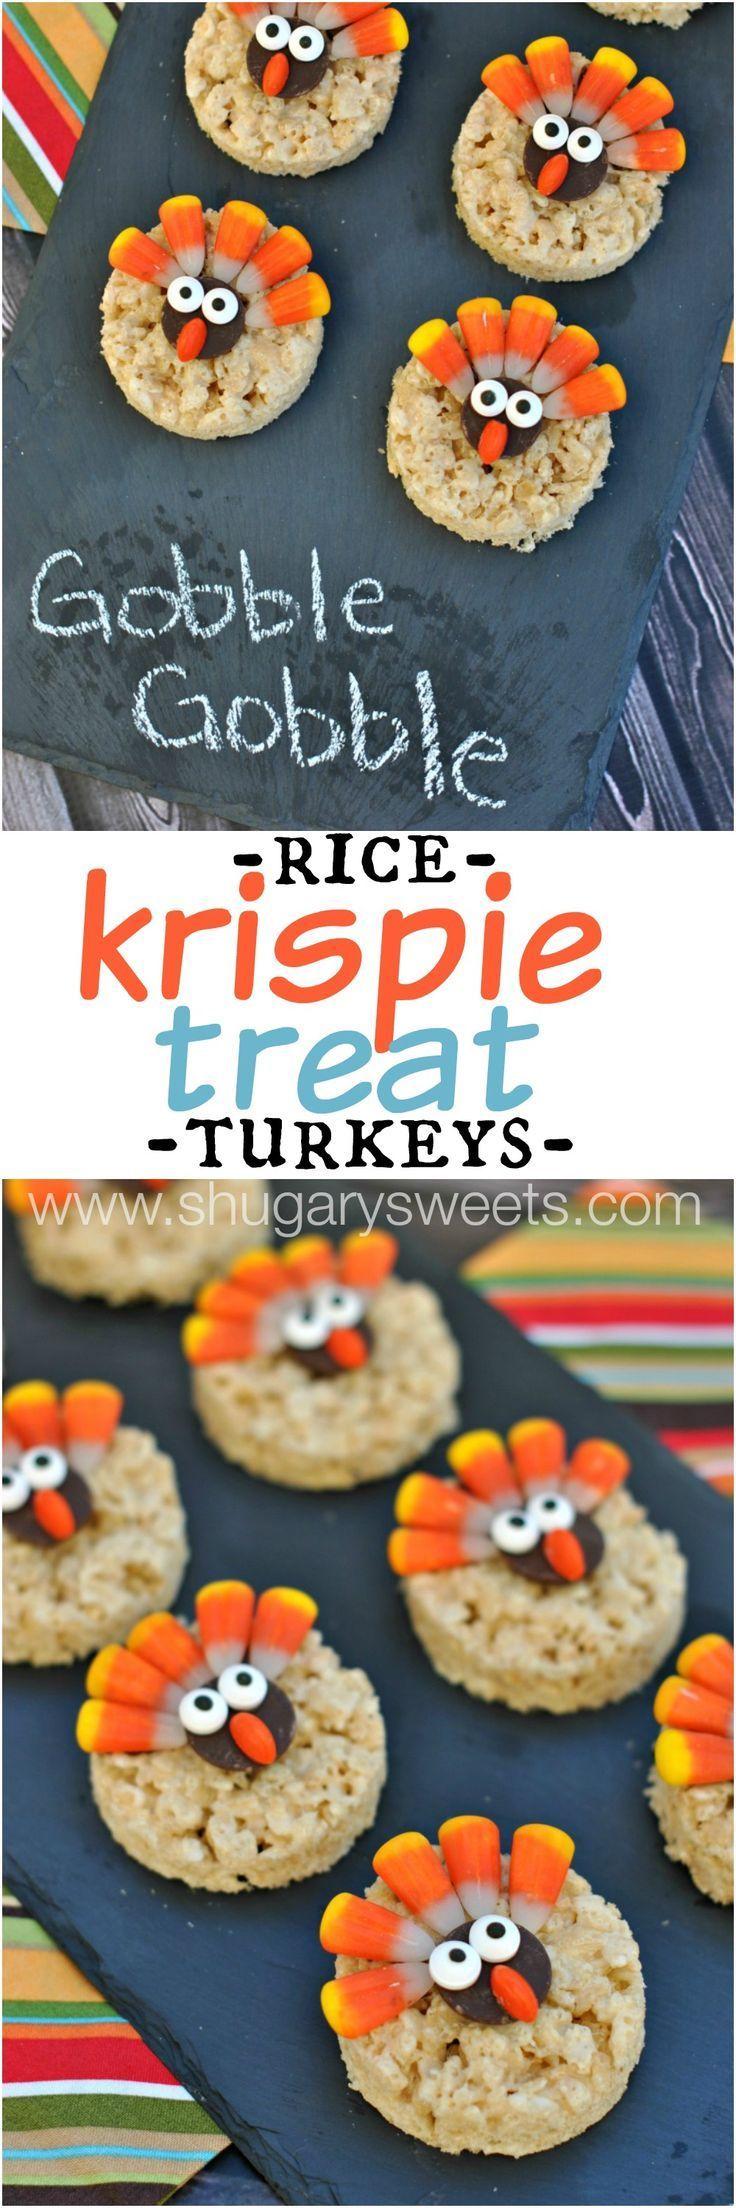 Turkey Rice Krispie Treats decorated for Thanksgiving! Easy dessert that kids can help make!